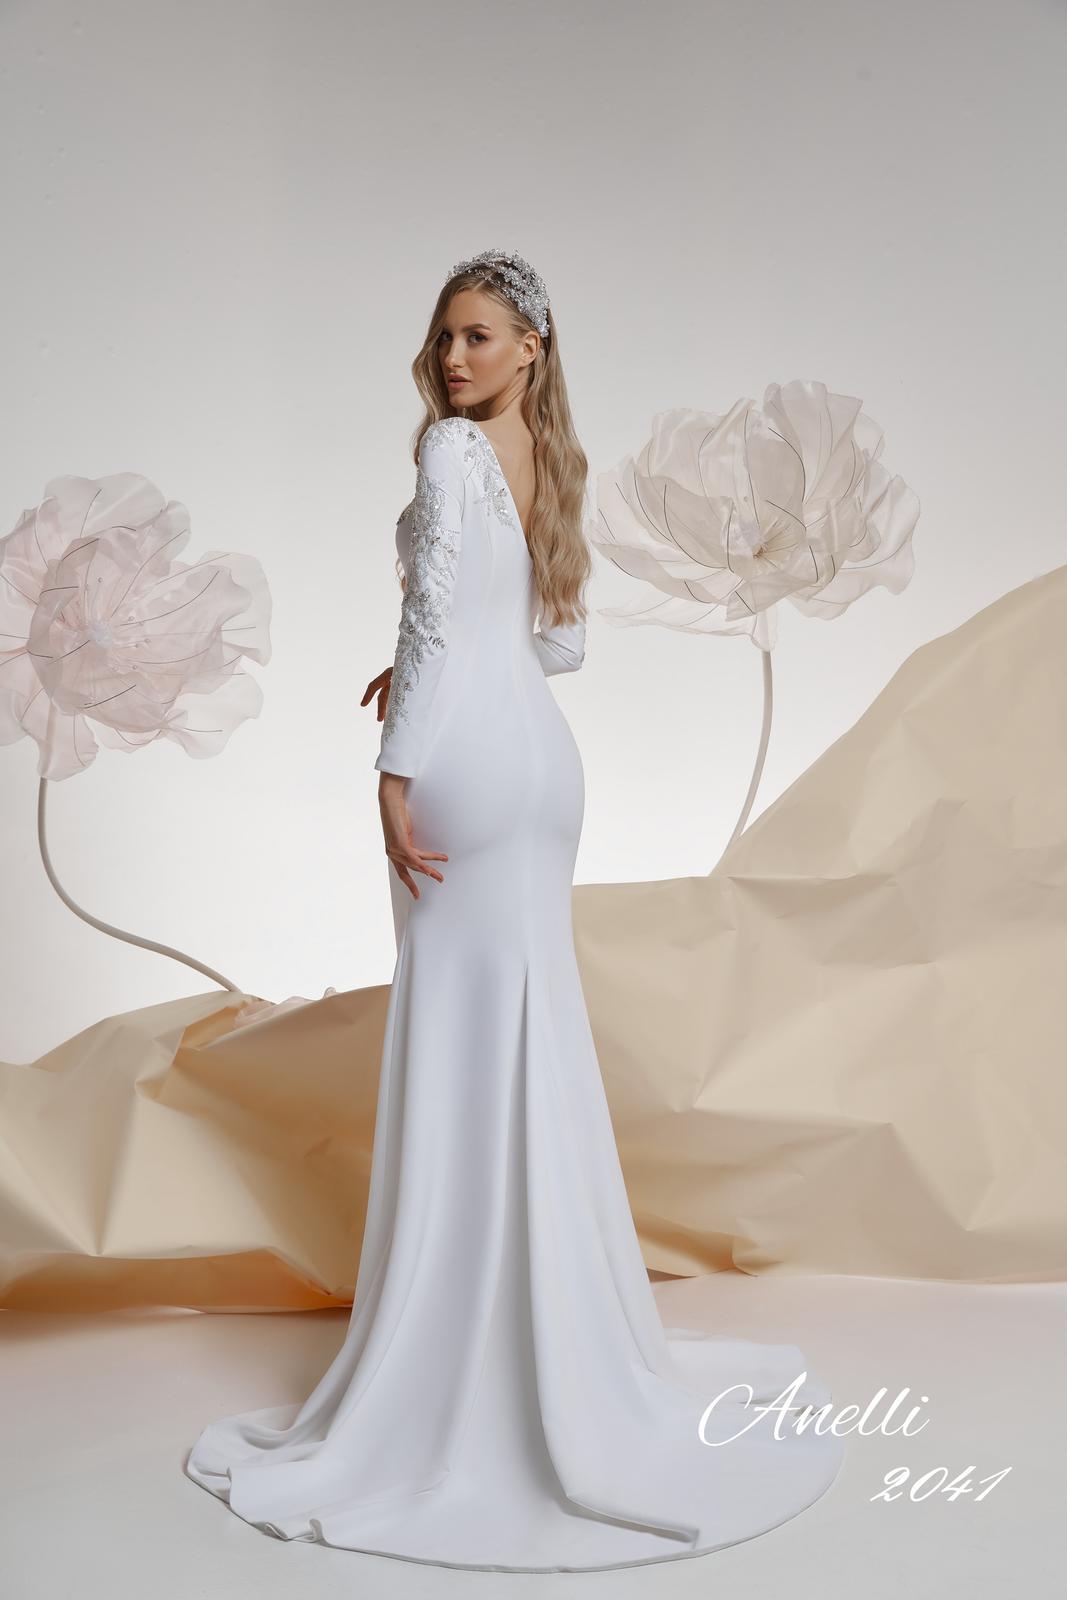 Svadobné šaty - Imagine 2041 - Obrázok č. 3